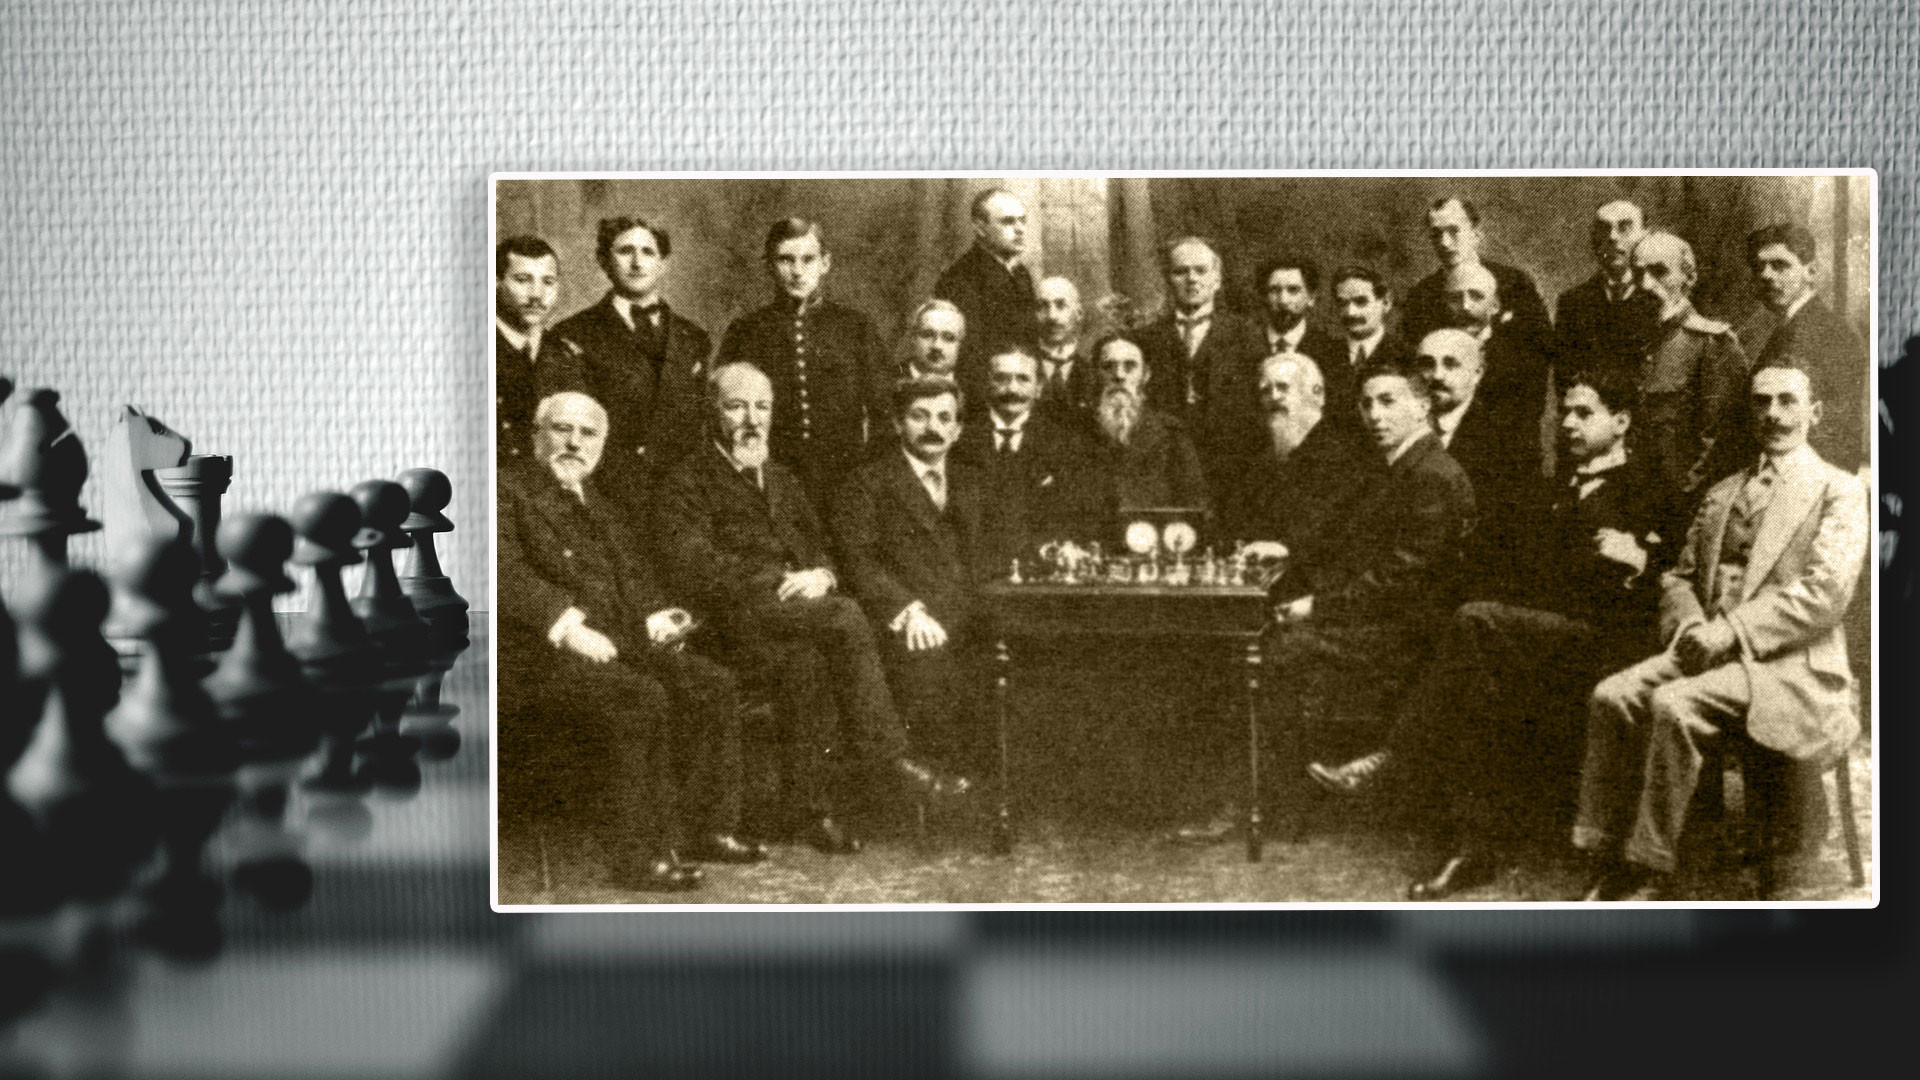 Участники международного шахматного турнира в Петербурге — Хосе Капабланка (второй справа сидит), Эмануэль Ласкер (третий слева сидит), Александр Алехин (третий слева стоит). Коллаж © L!FE. Фото: © РИА Новости